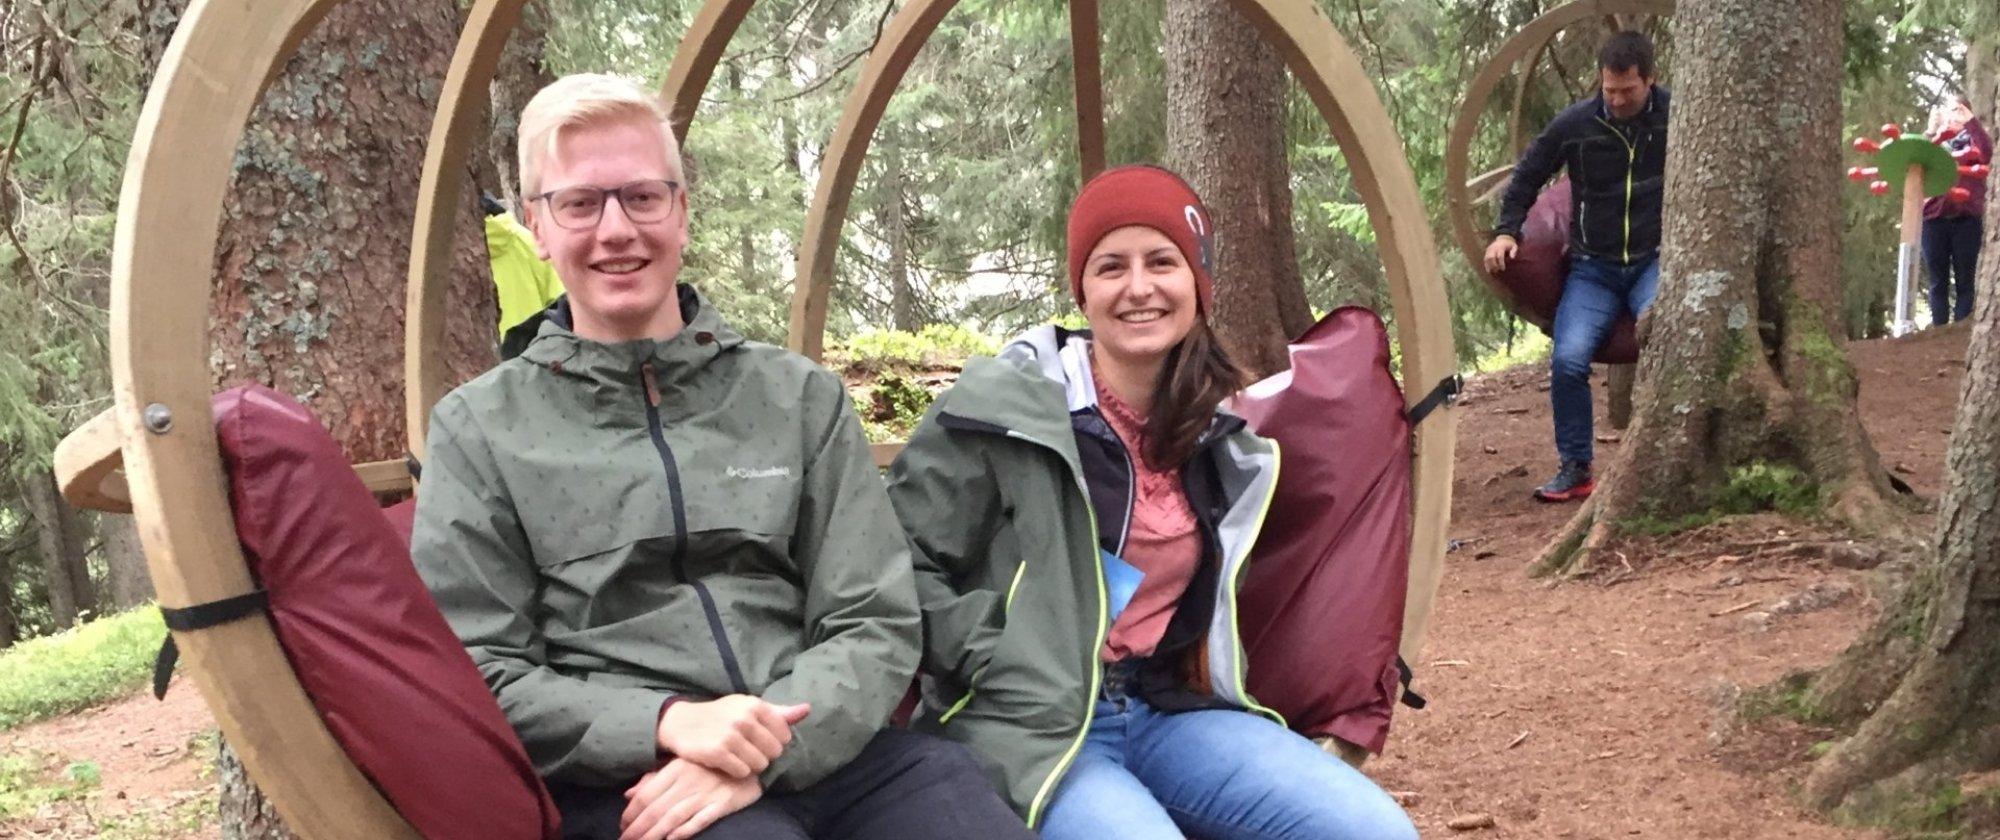 Team-Ausflug Erlebnispark Mooraculm, Sörenberg